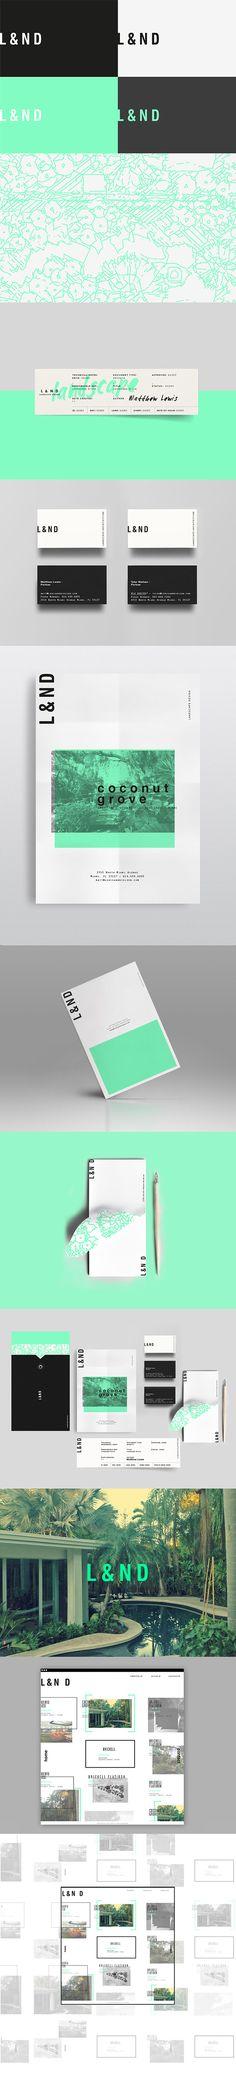 Lewis&Nielsen /Mint & Black ///Branding, Graphic Design on Behance Brand Identity Design, Graphic Design Branding, Corporate Design, Typography Design, Corporate Identity, Identity Branding, Brand Design, Brochure Design, Web Design